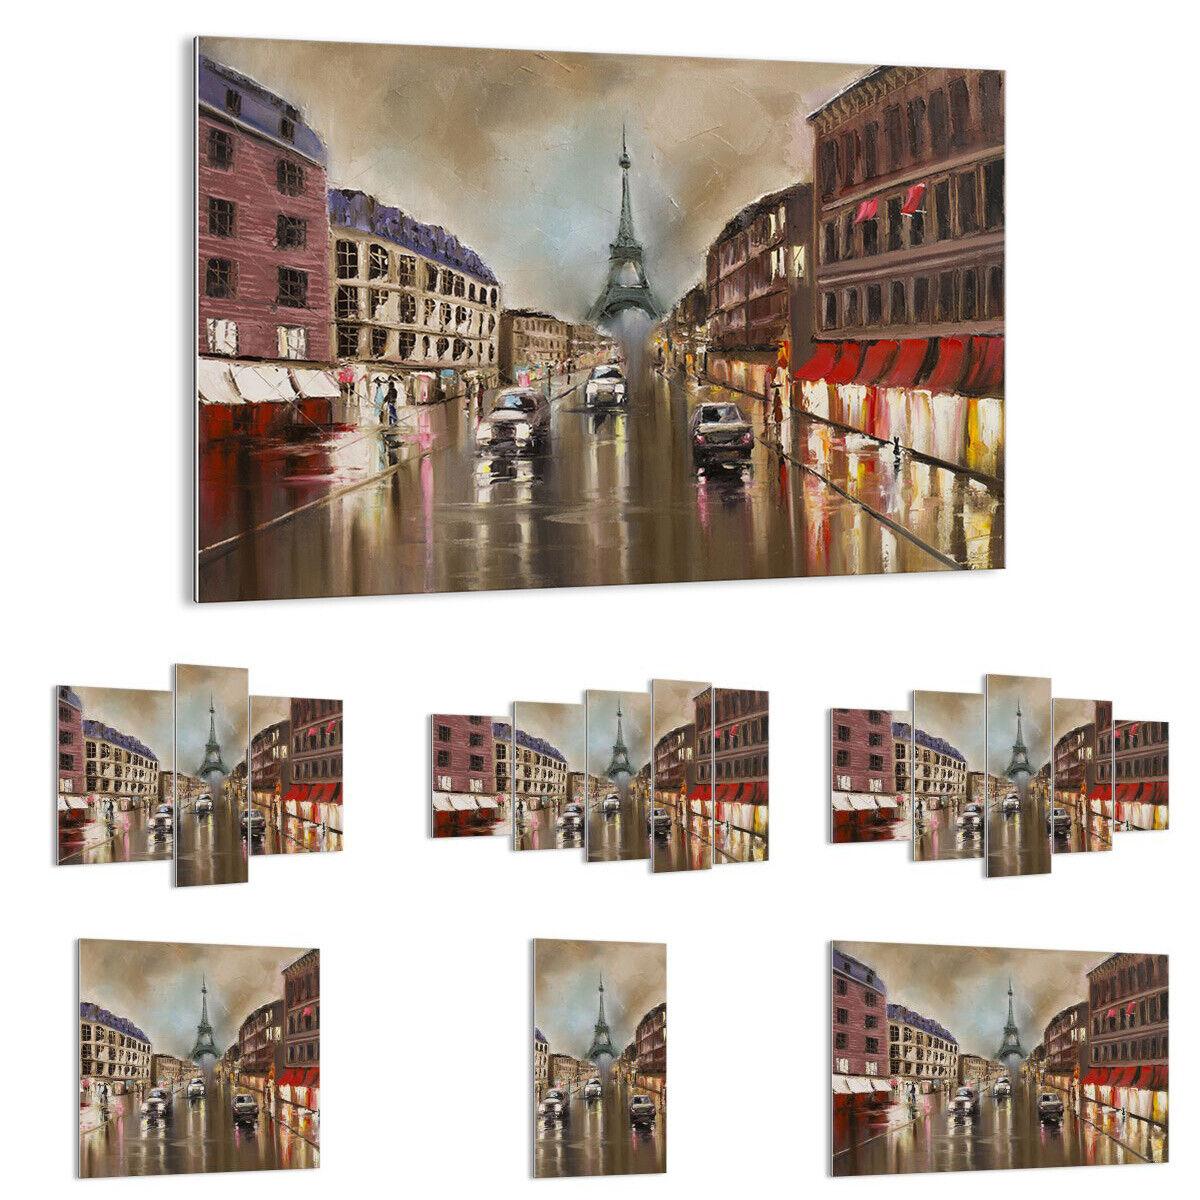 GLASS PRINTS Image Wall Art Paris tower street 3431 UK